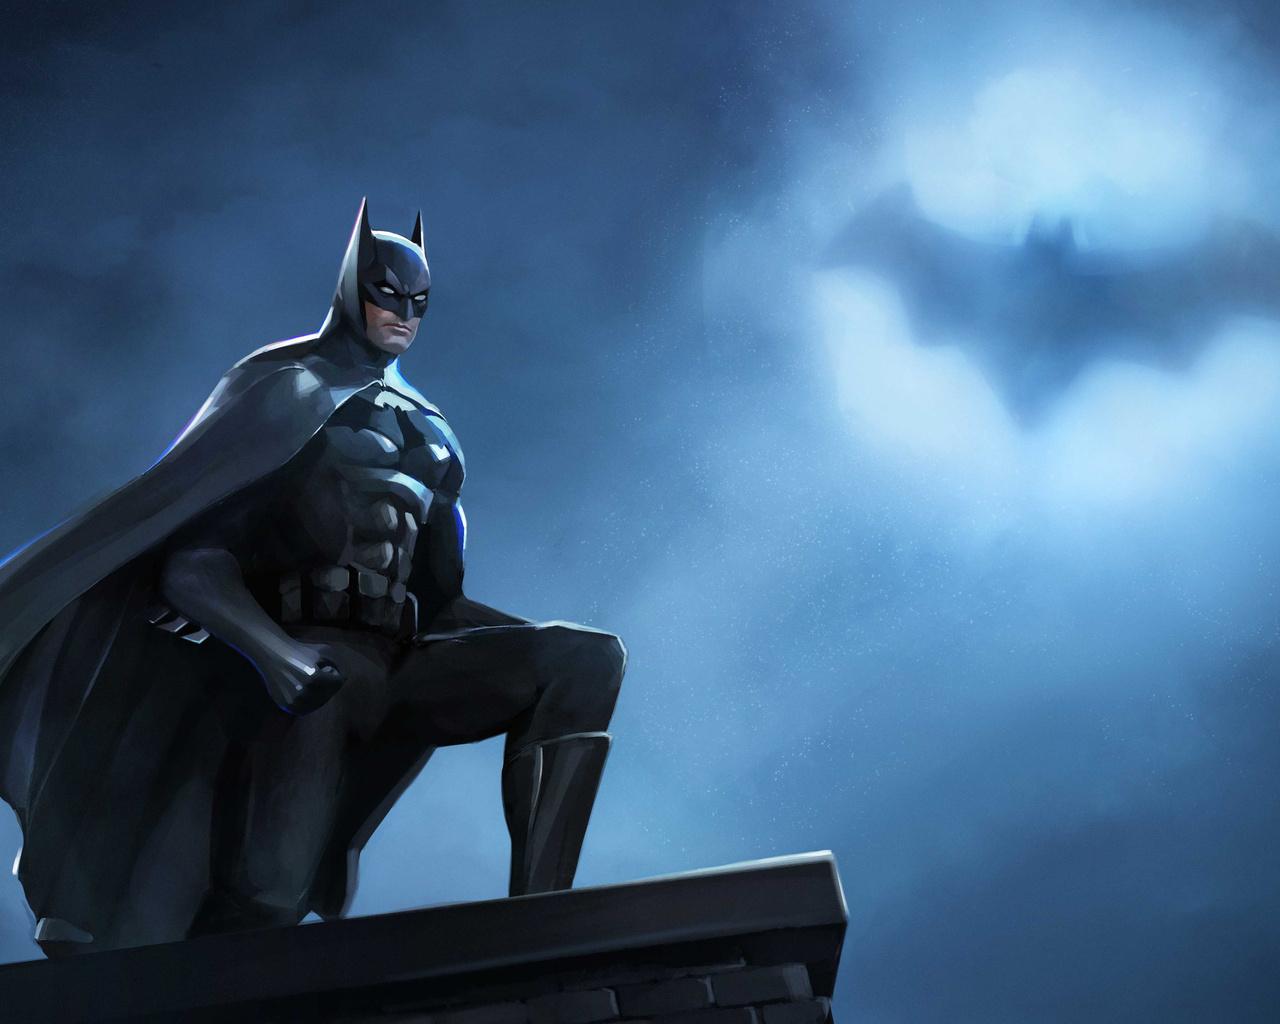 artwork-batman-knight-yh.jpg